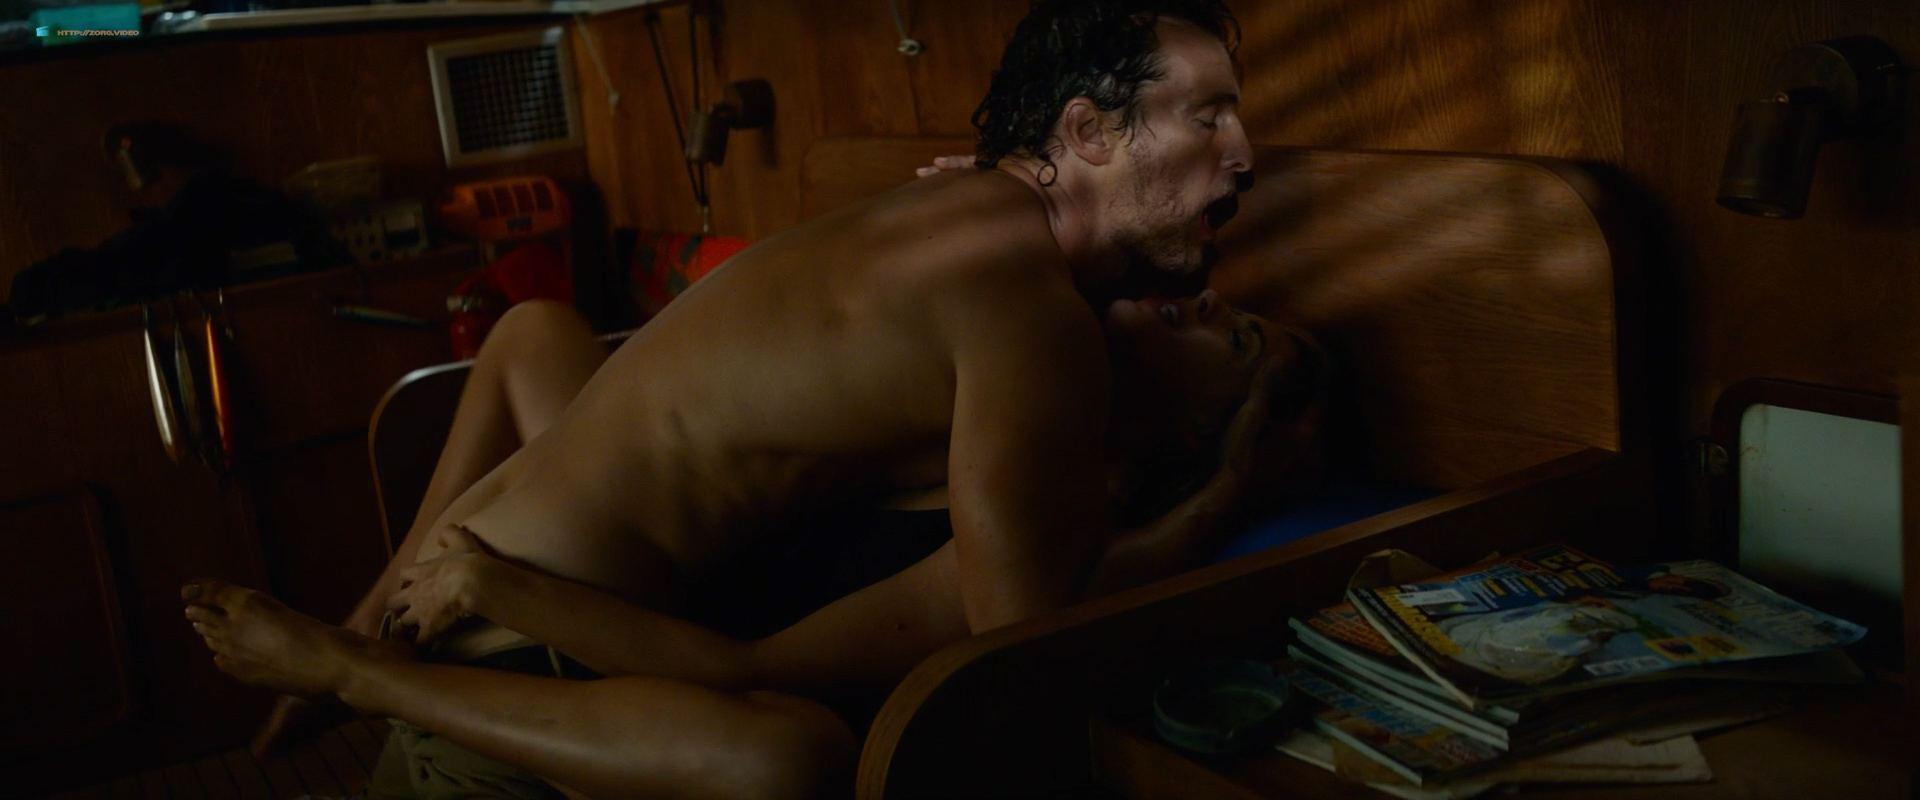 0201153347964_06_Anne-Hathaway-hot-in-sex-scene-Serenity-2019-HD-1080p-BluRay-00011.jpg